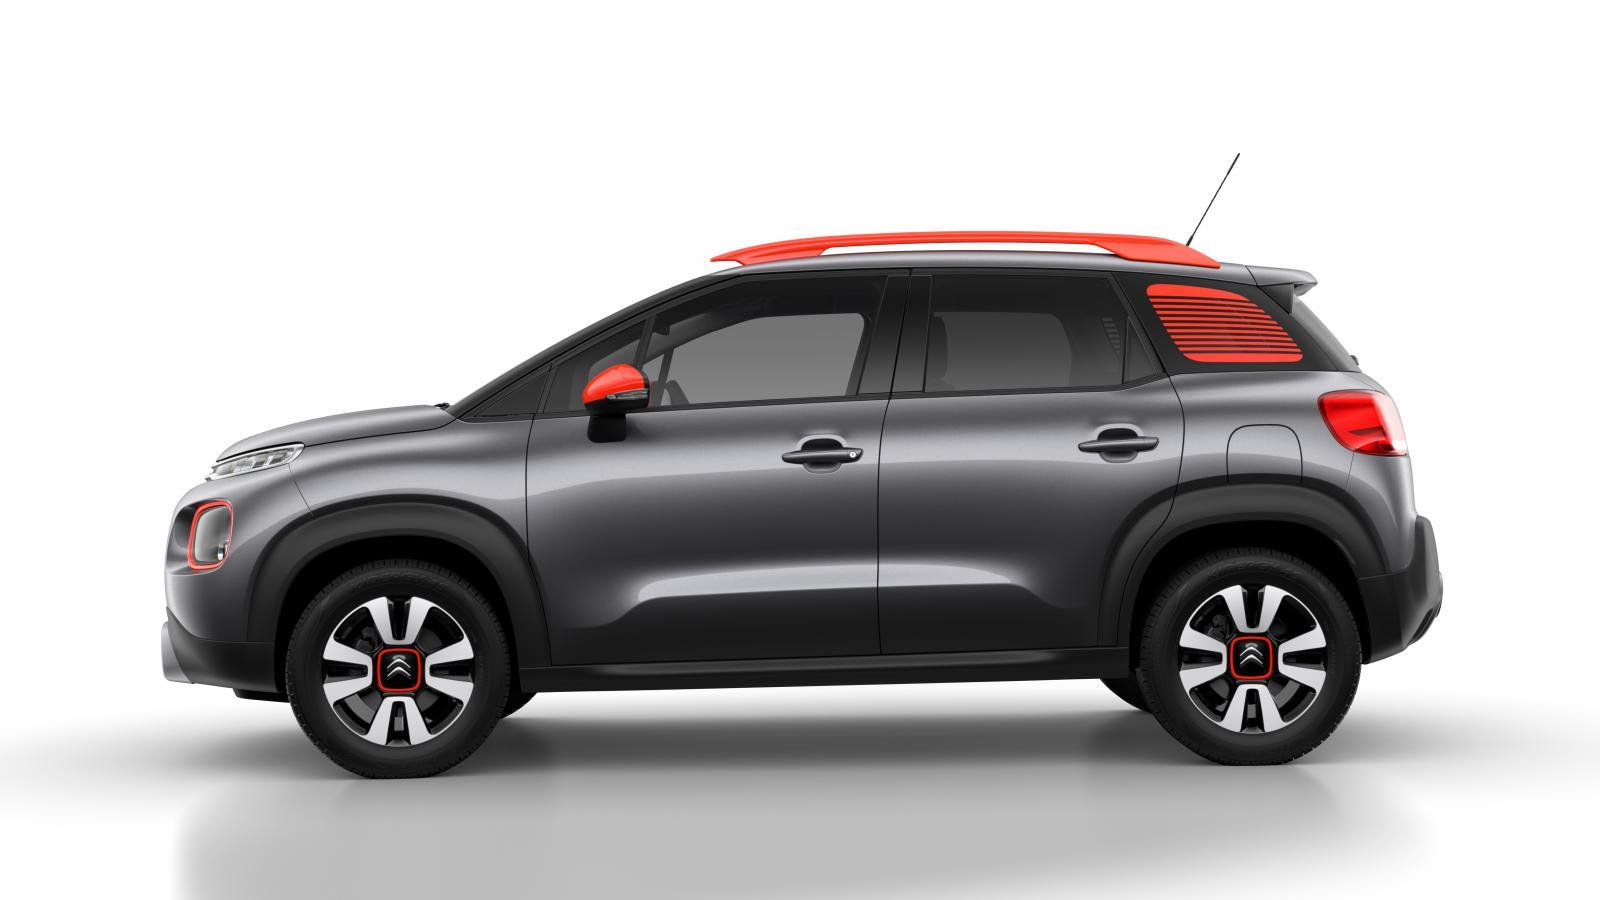 SUV Compact C3 Aircross - Misty Grey